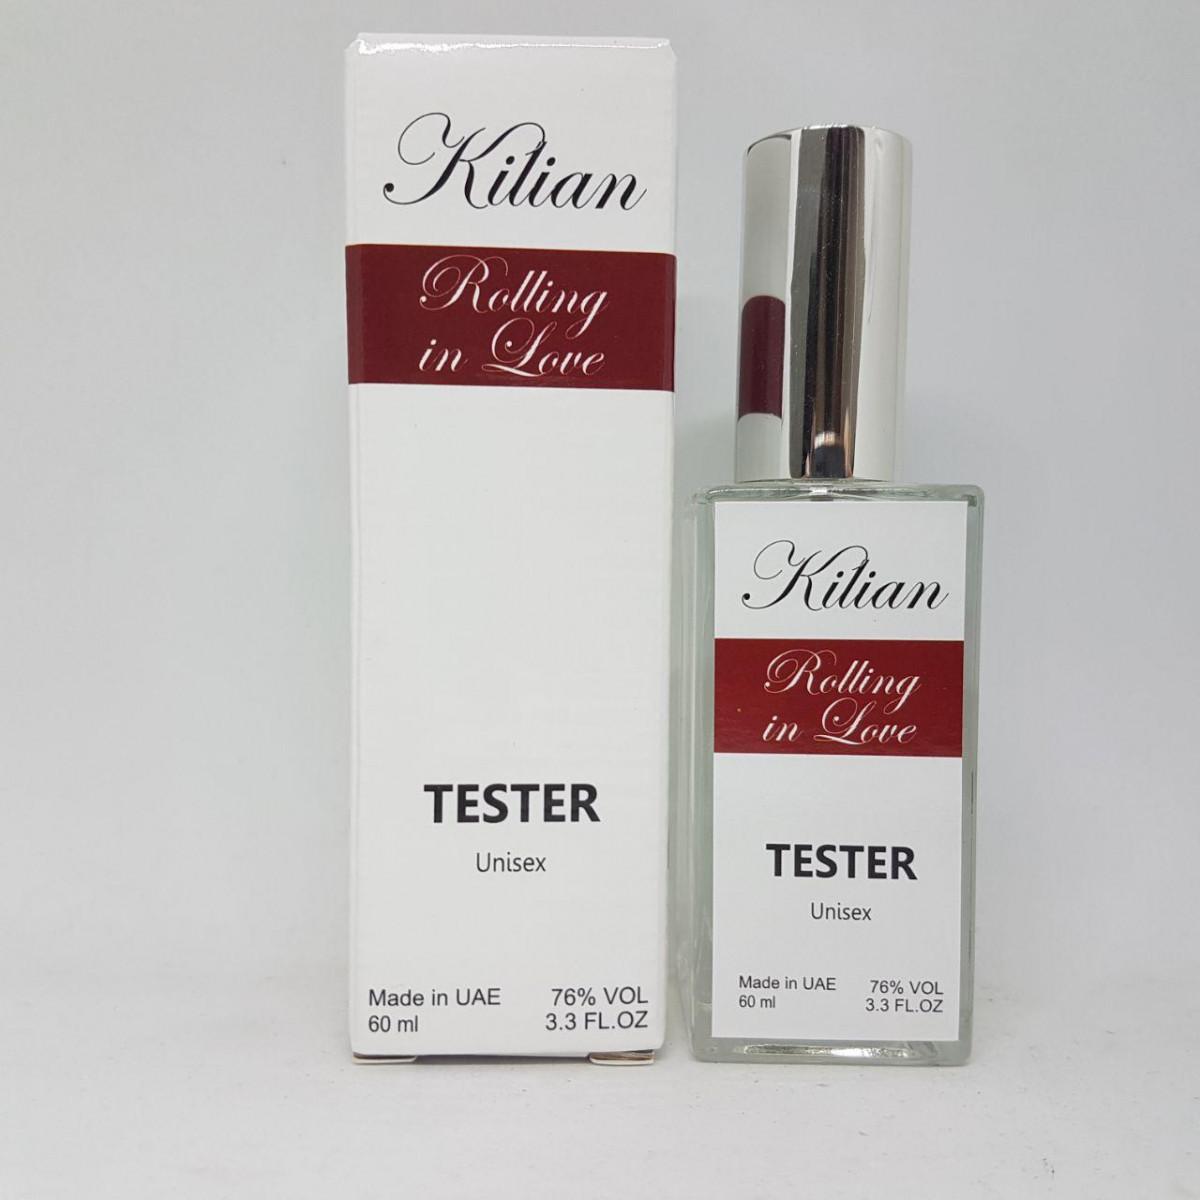 Kilian Rolling in Love - Dubai Tester 60ml